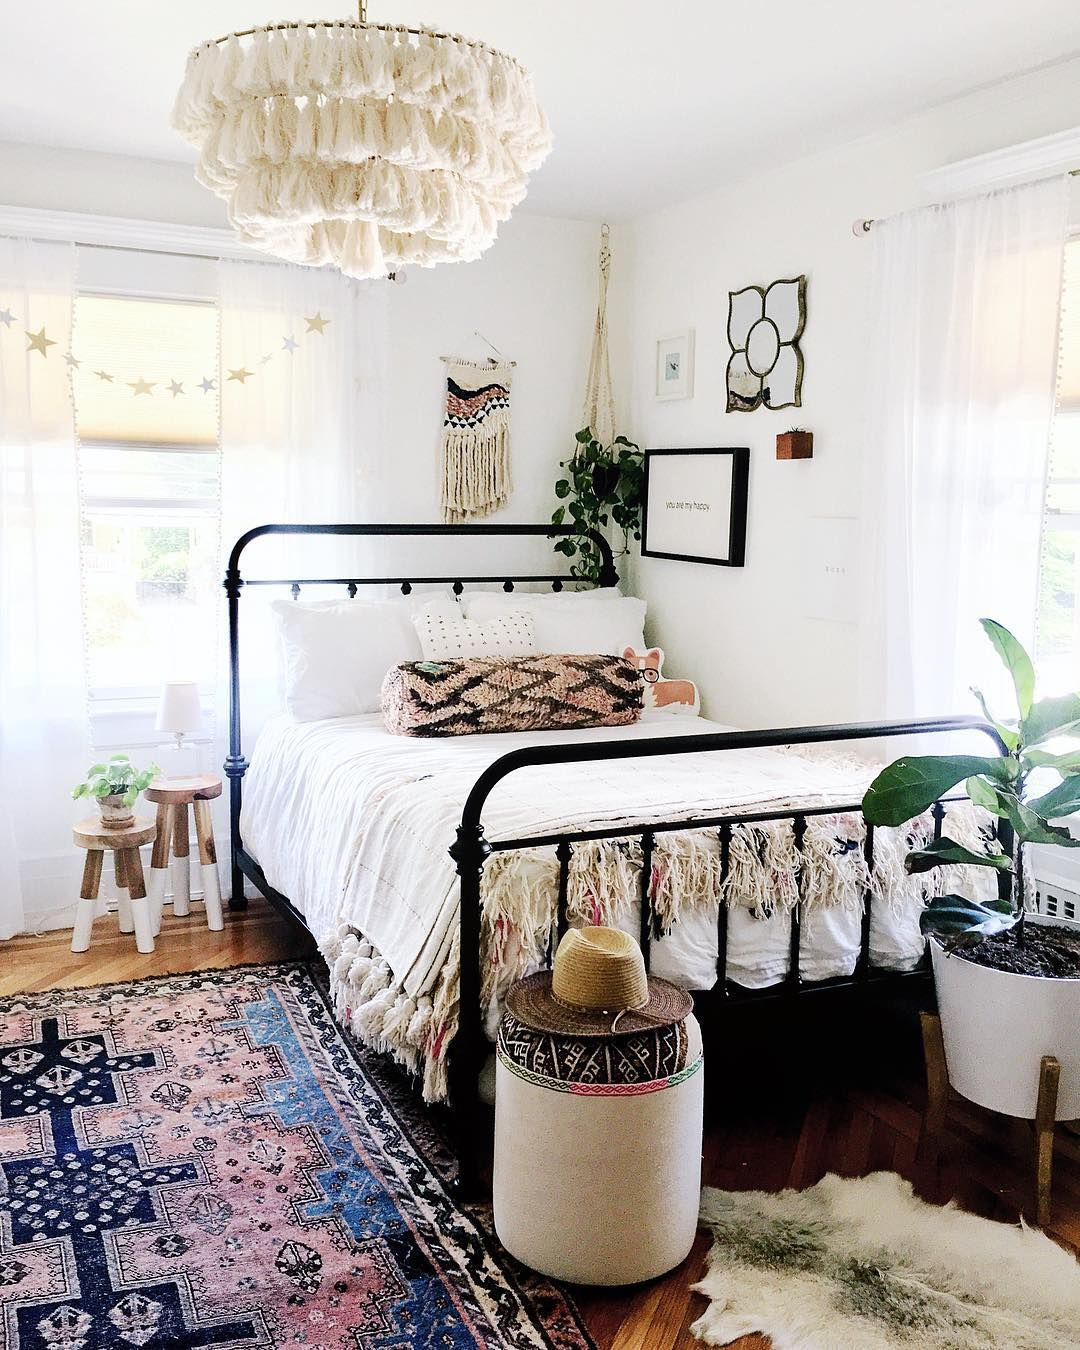 Fela Tassel Chandelier Eclectic Bedroom Simple Bedroom Eclectic Decor Bedroom